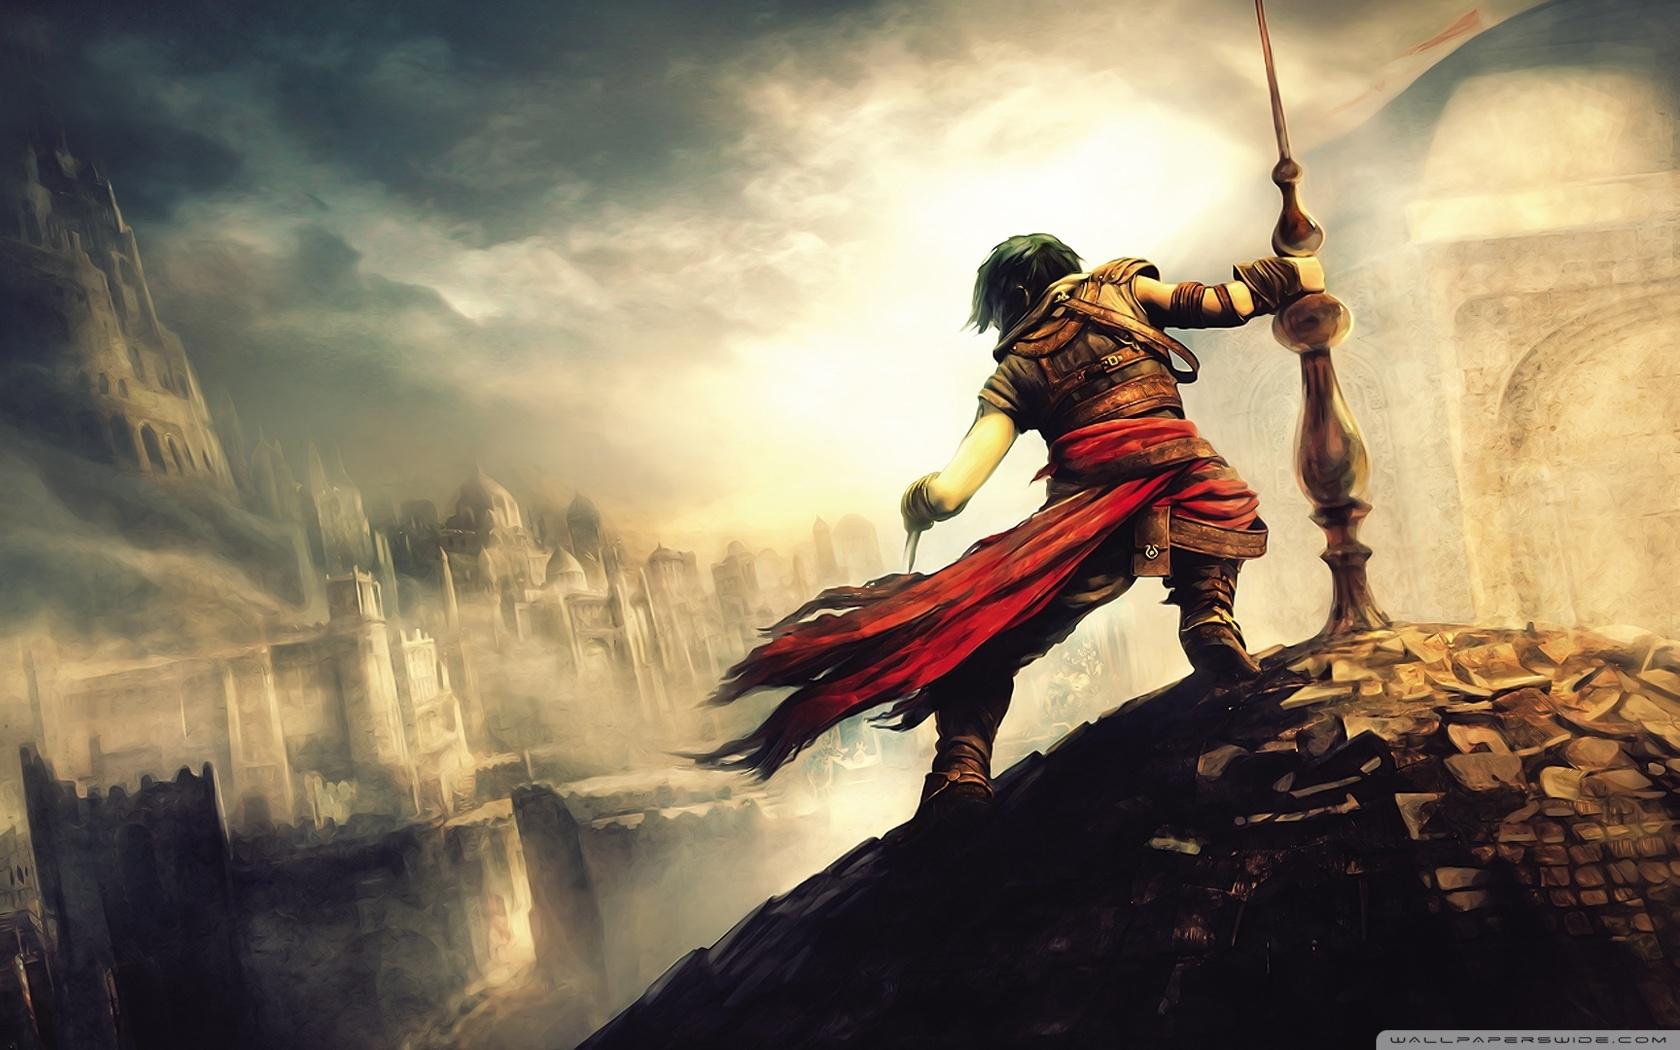 prince of persia the forgotten sands ❤ 4k hd desktop wallpaper for